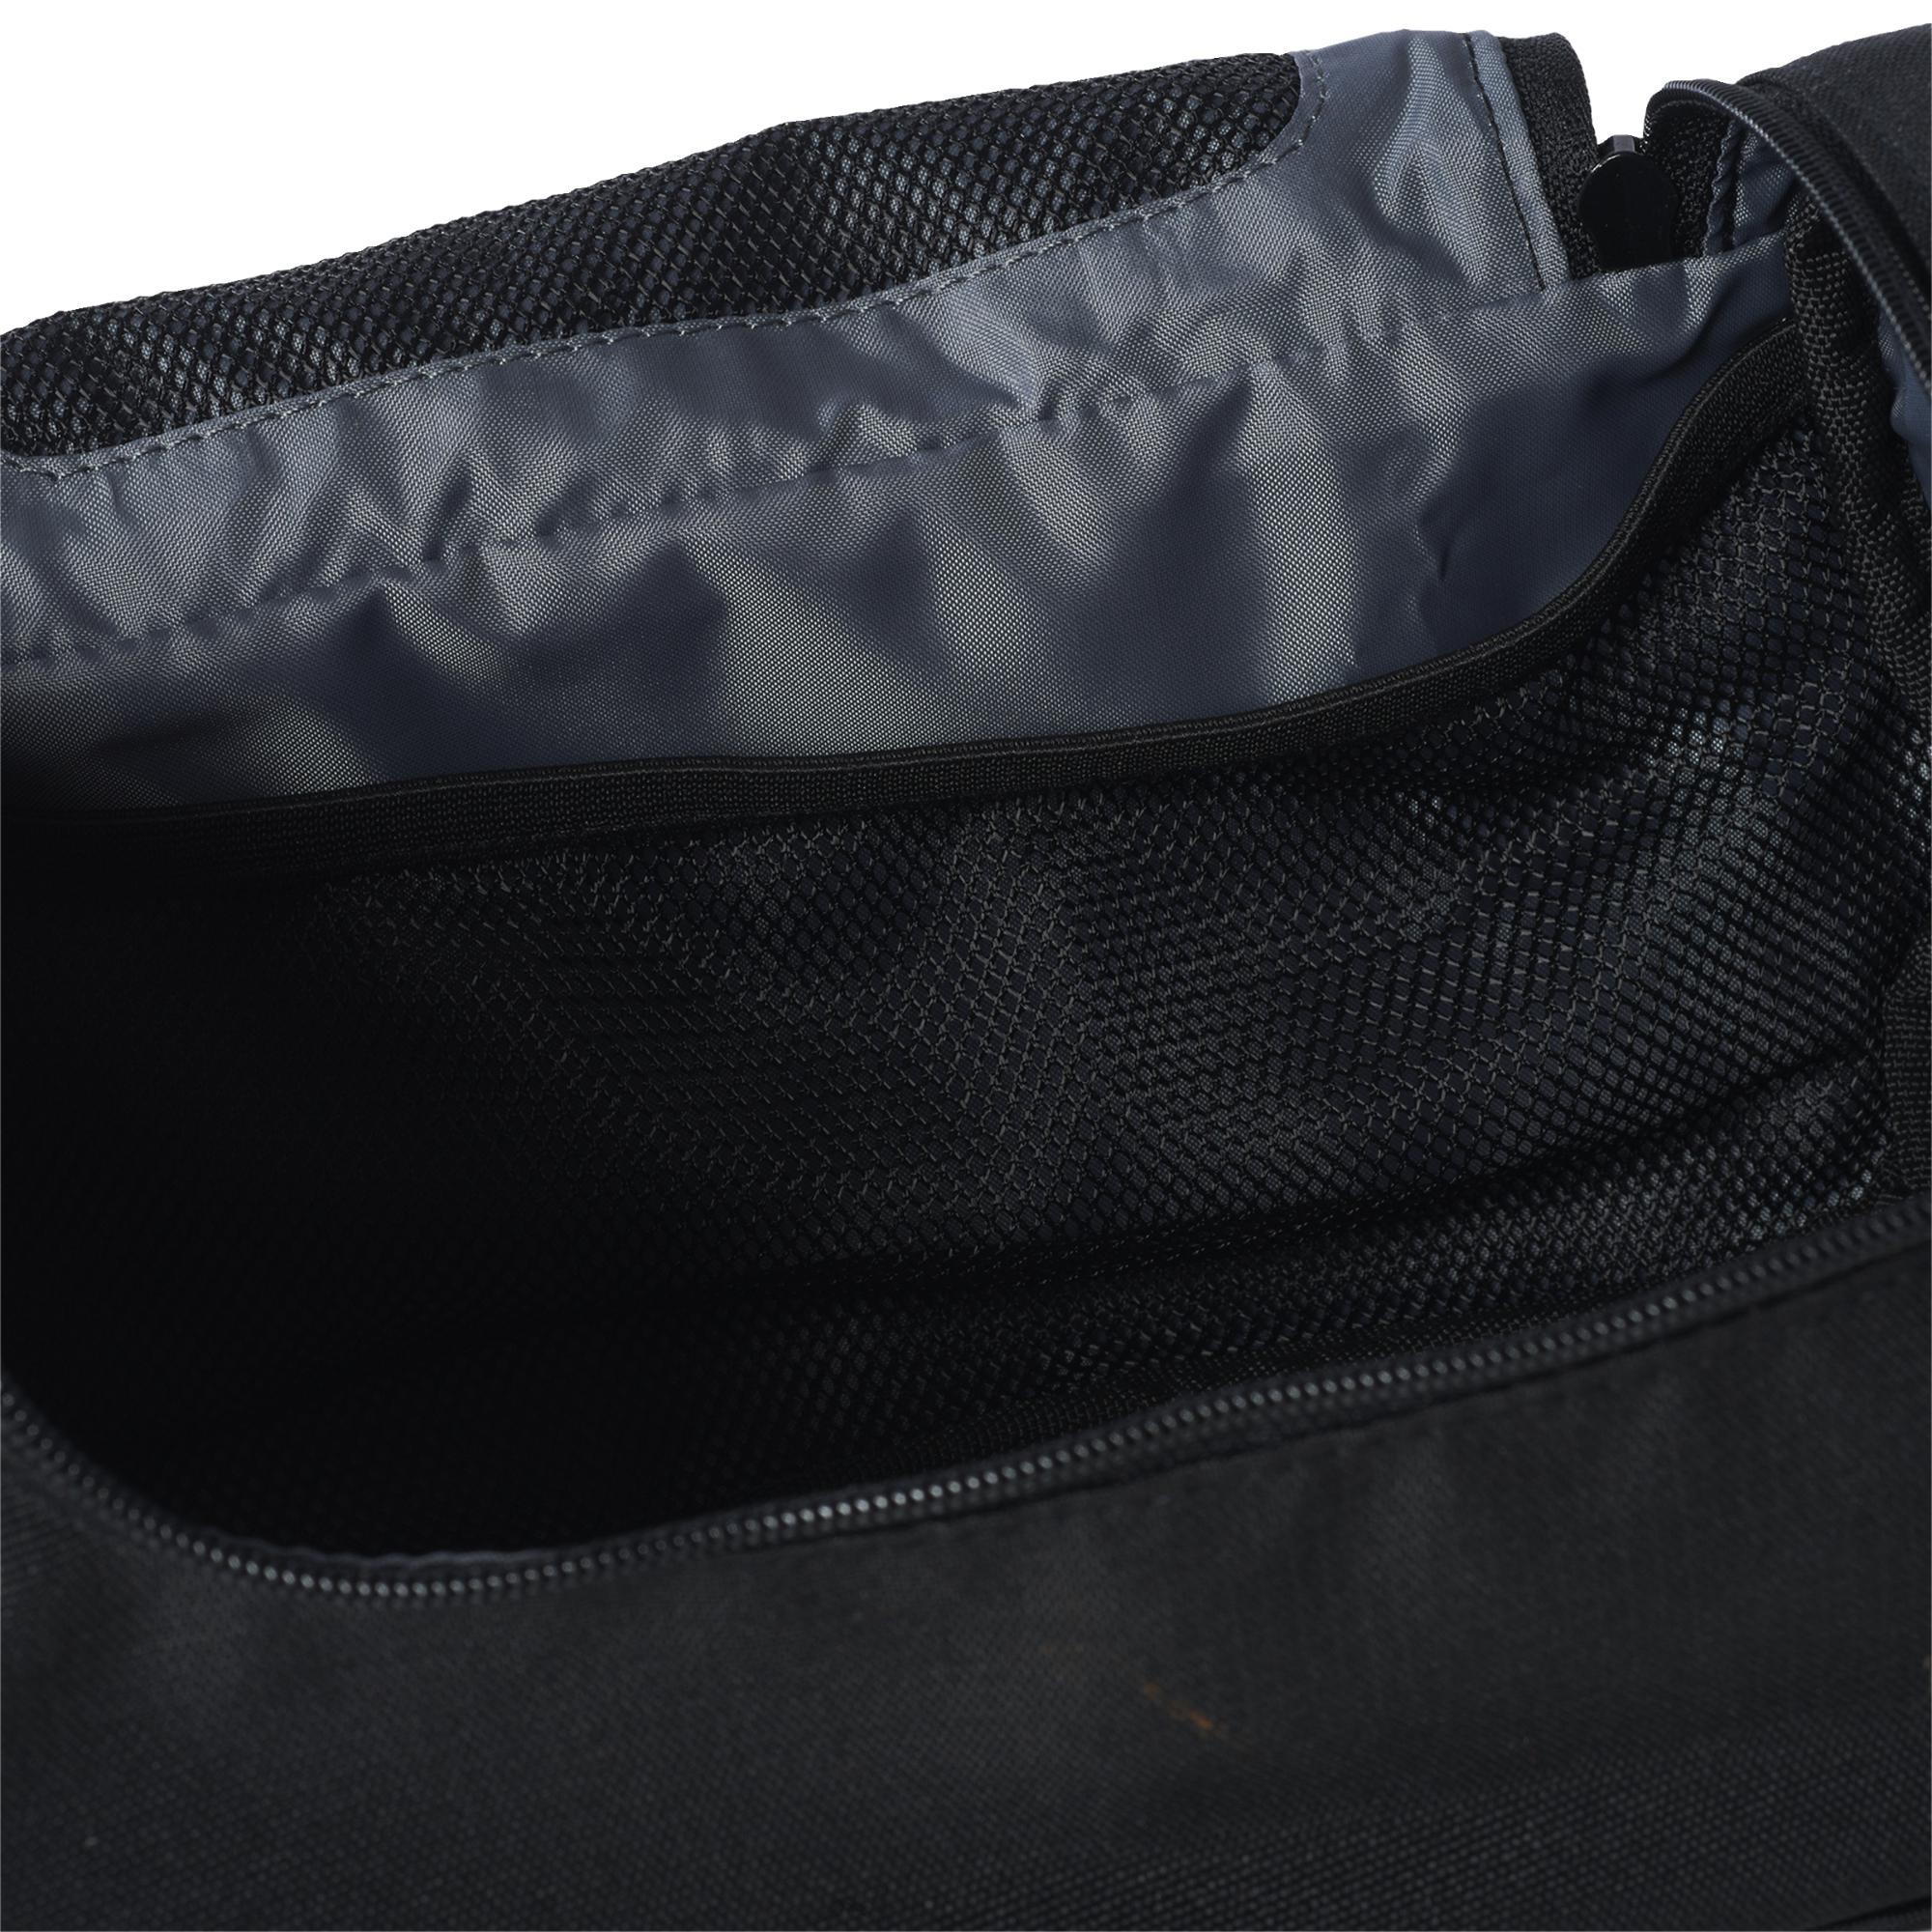 carbón Timor Oriental postura  Adidas Neceser Training (negro) - Manelsanchezstyle.com